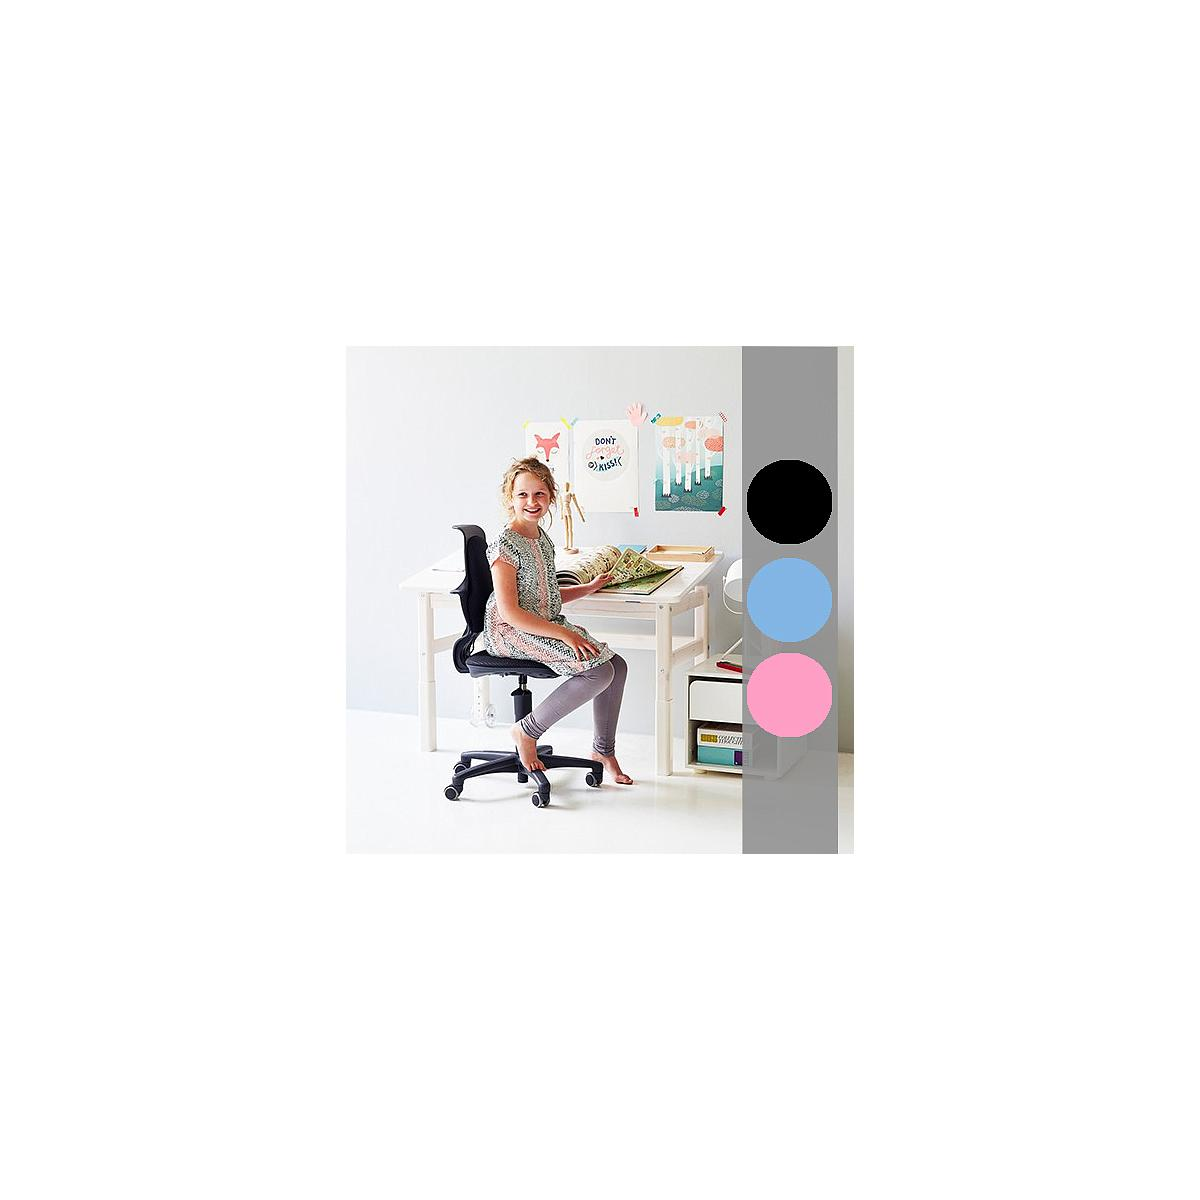 Silla oficina ergonómica STUDY Flexa negra